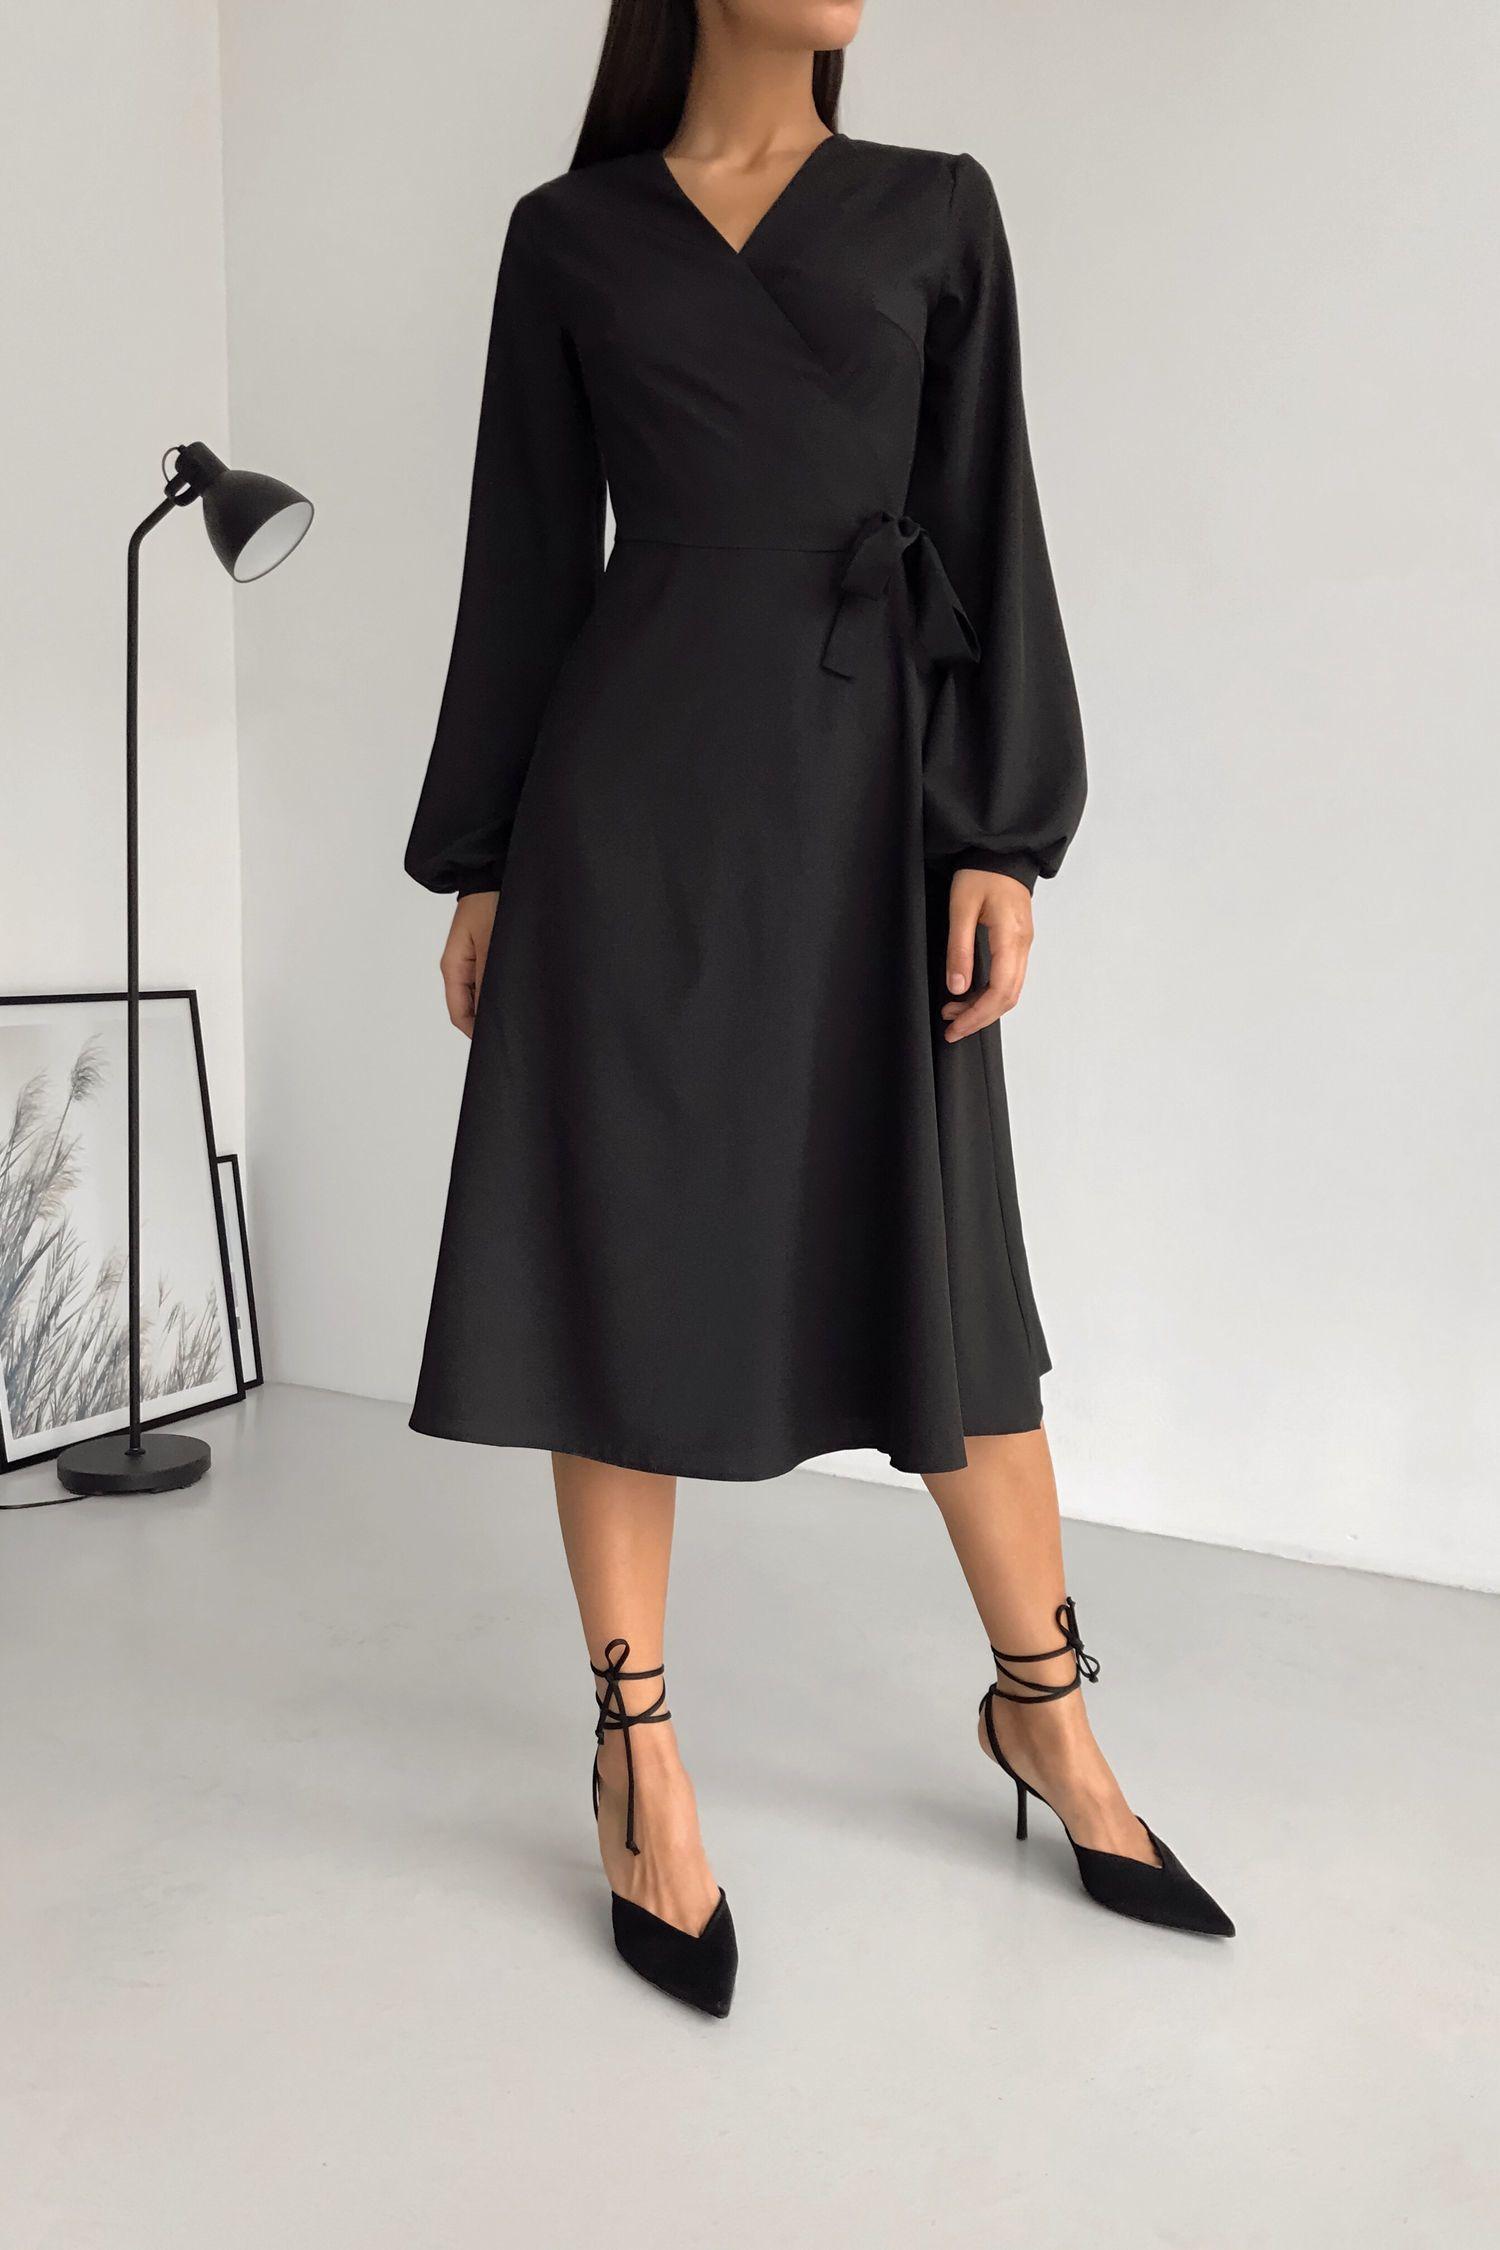 Платье миди на запах черное - THE LACE